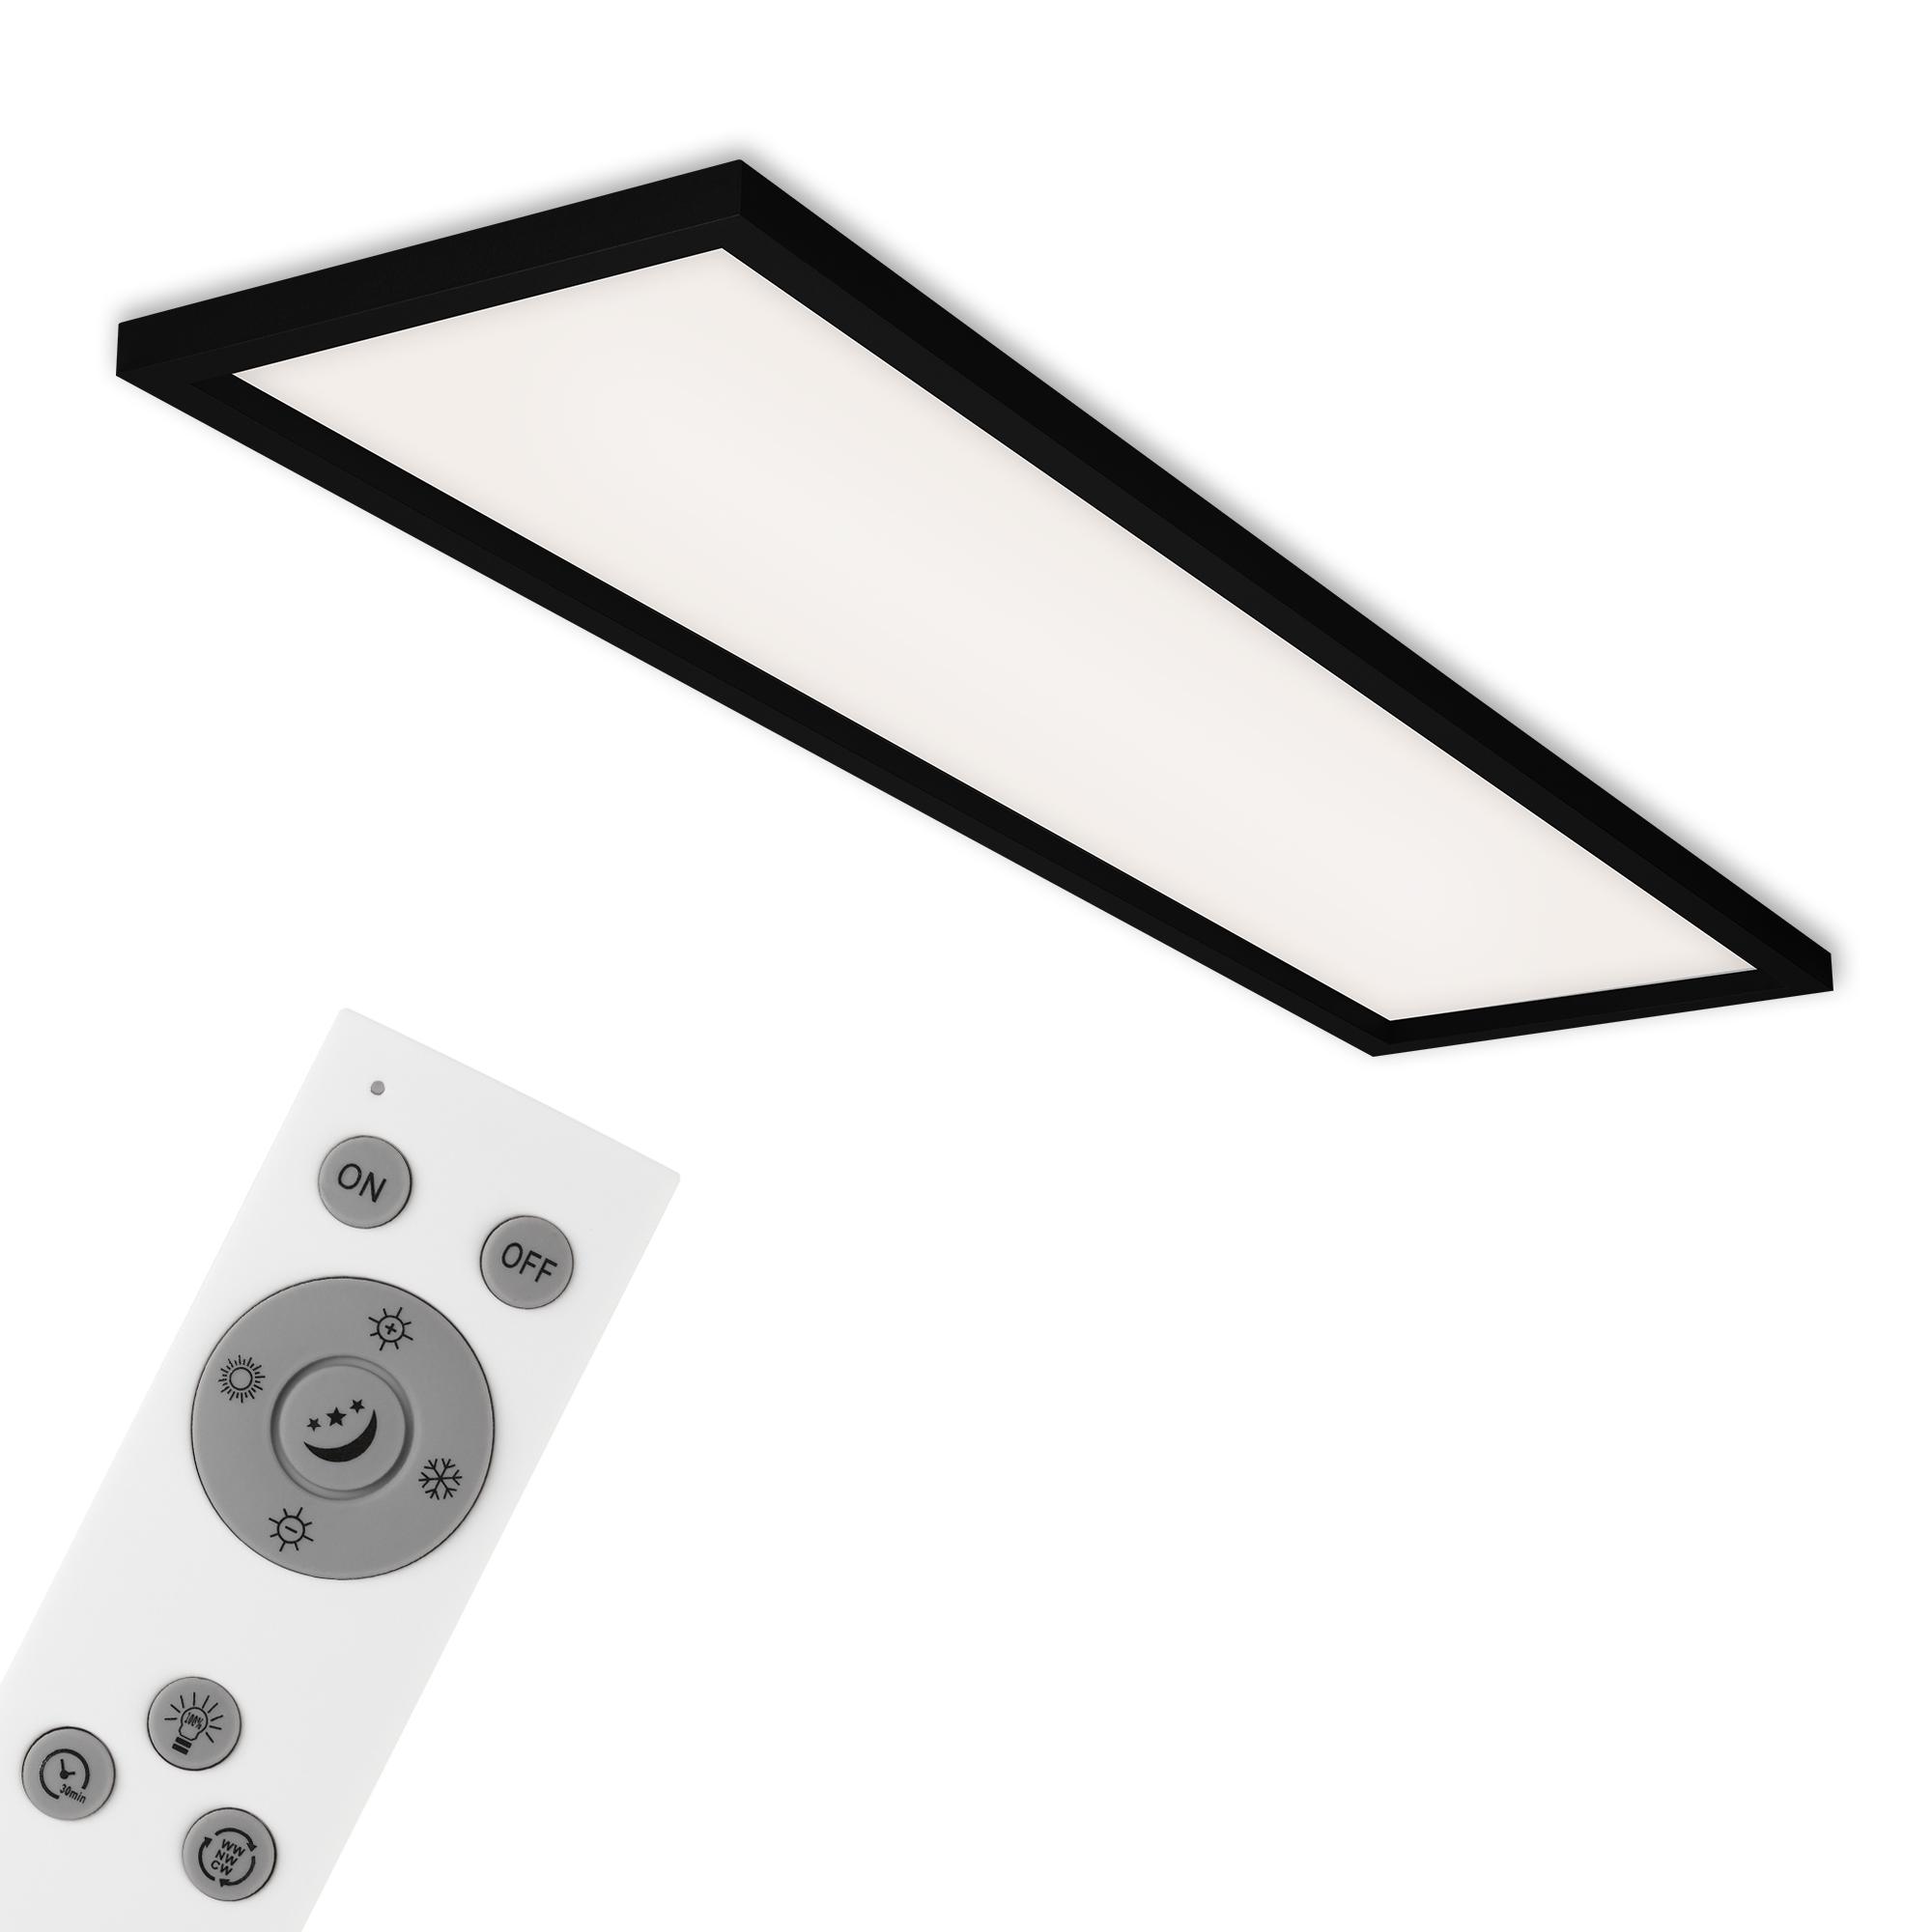 CCT LED Panel, 119,5 cm, 3800 LUMEN, 36 WATT, Schwarz